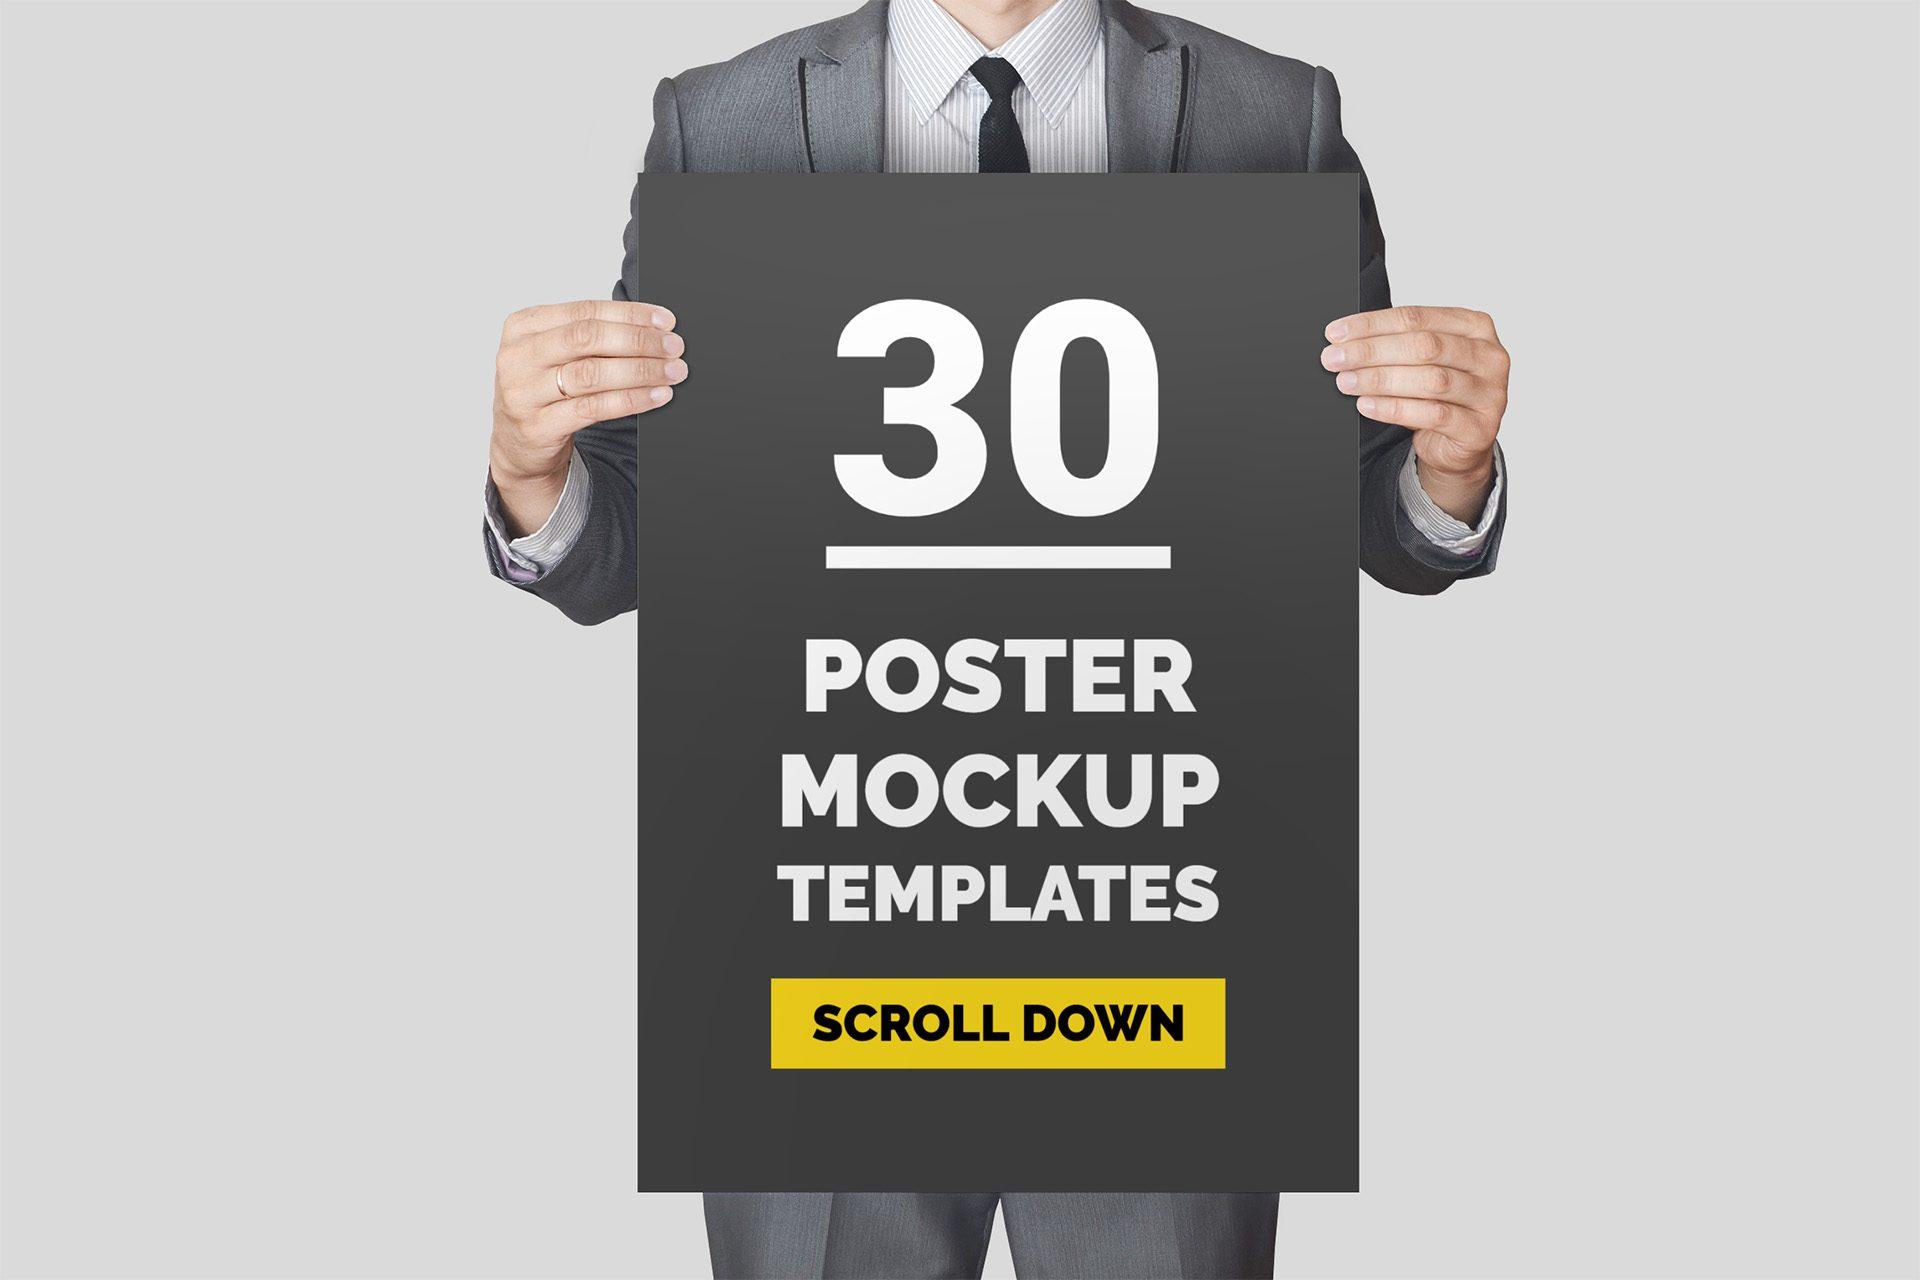 30-poster-mockup-templates